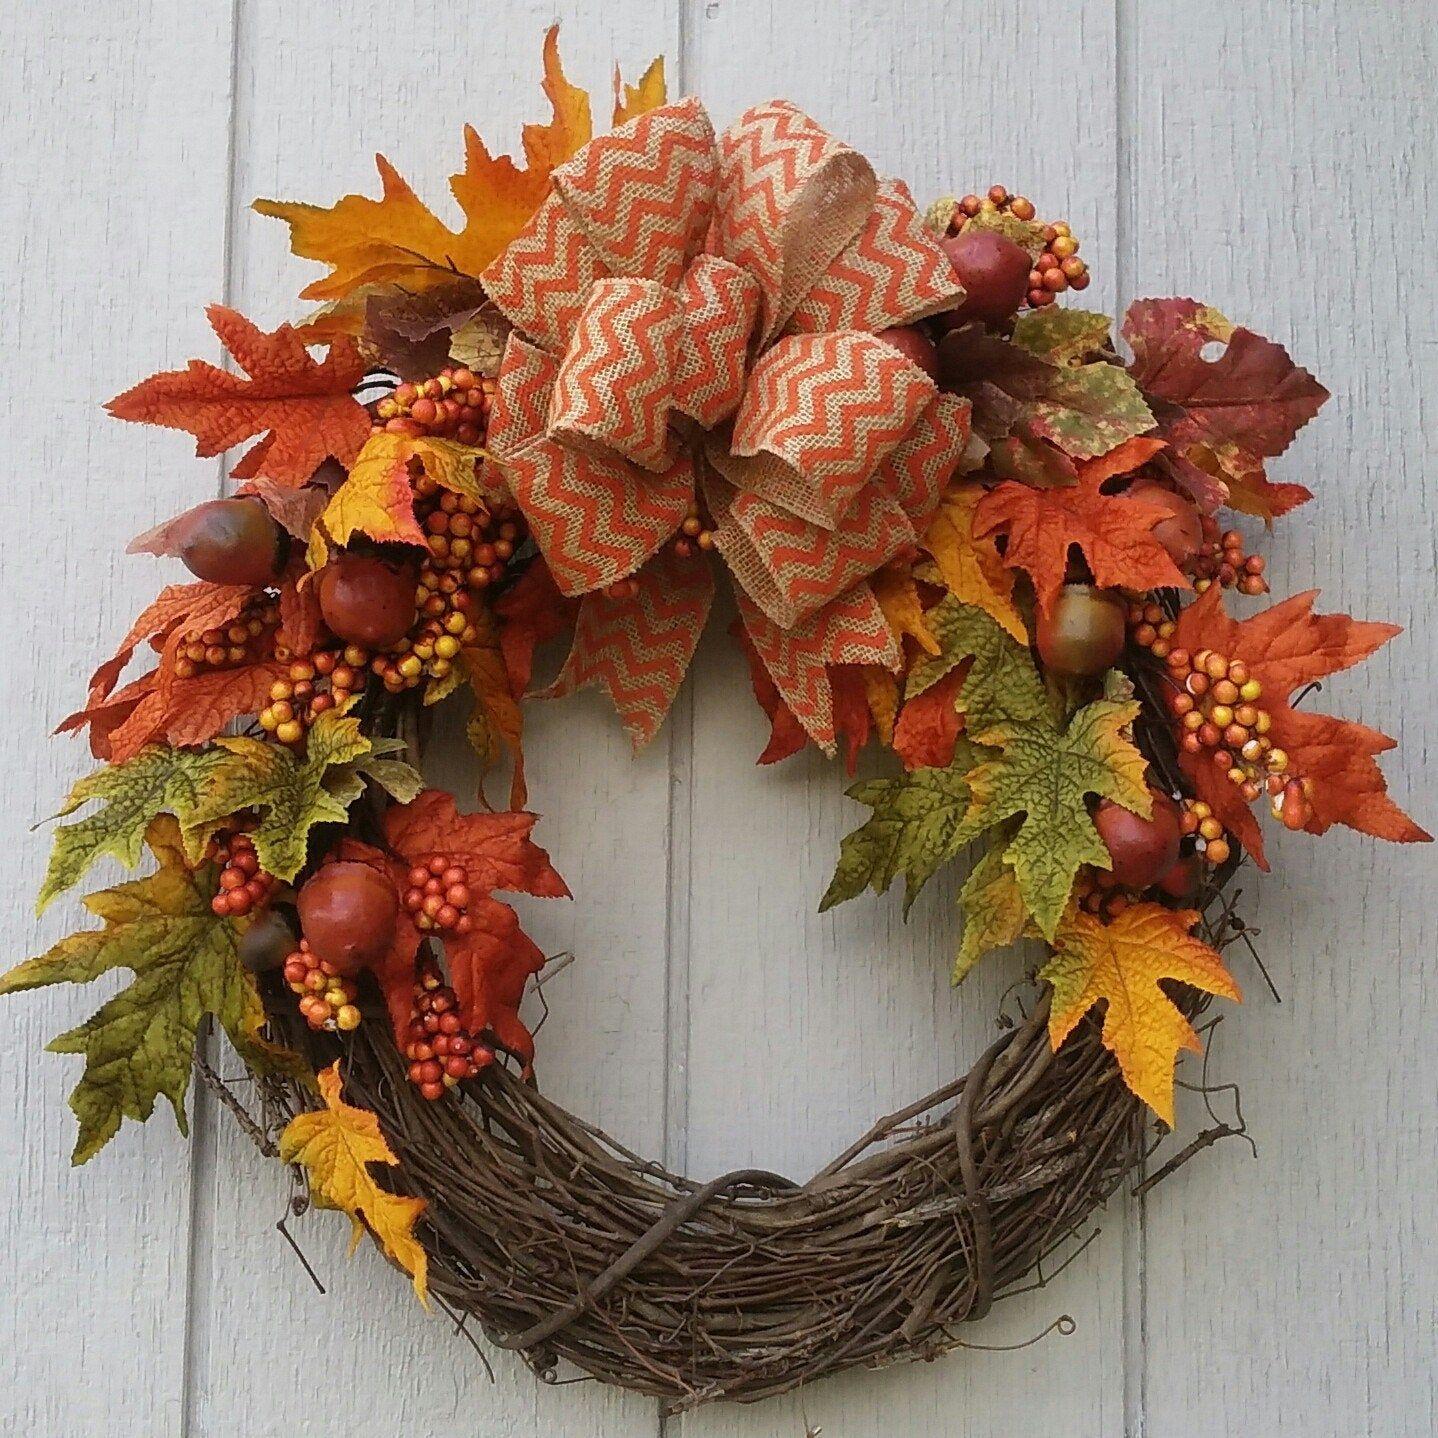 Photo of Autumn grapevine wreath with burlap orange chevron, leaf print or moss green ribbon acorns berries autumn leaves oranges yellow red green